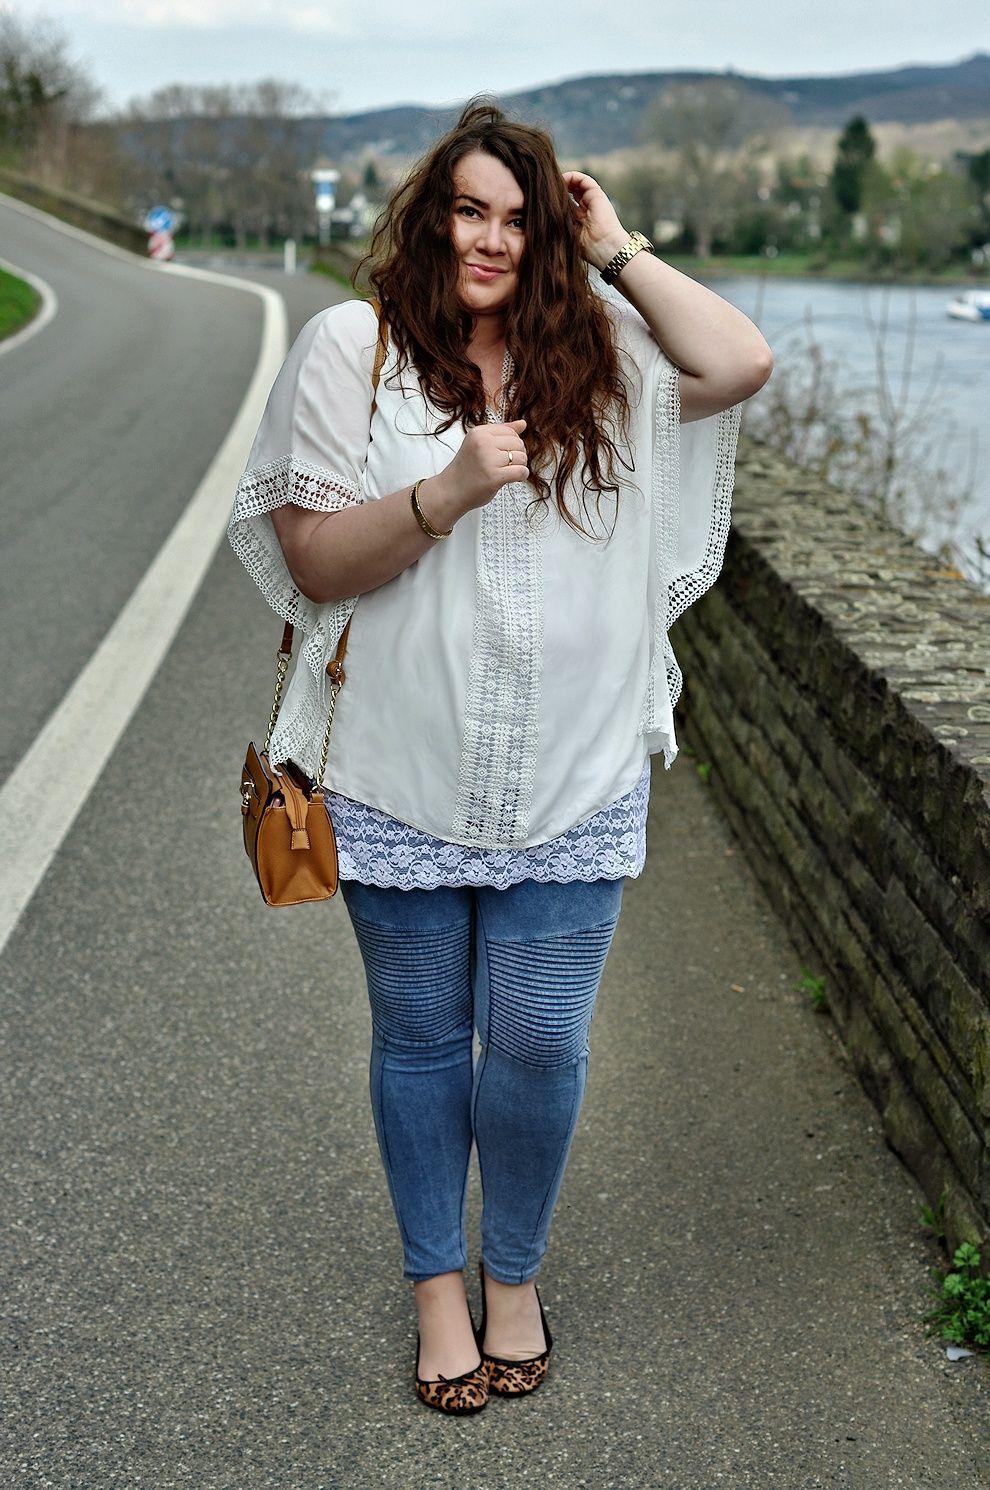 ee6e783350f72 Große Größen Plus Size Fashion Blog - hippie boho style - white poncho  shirt